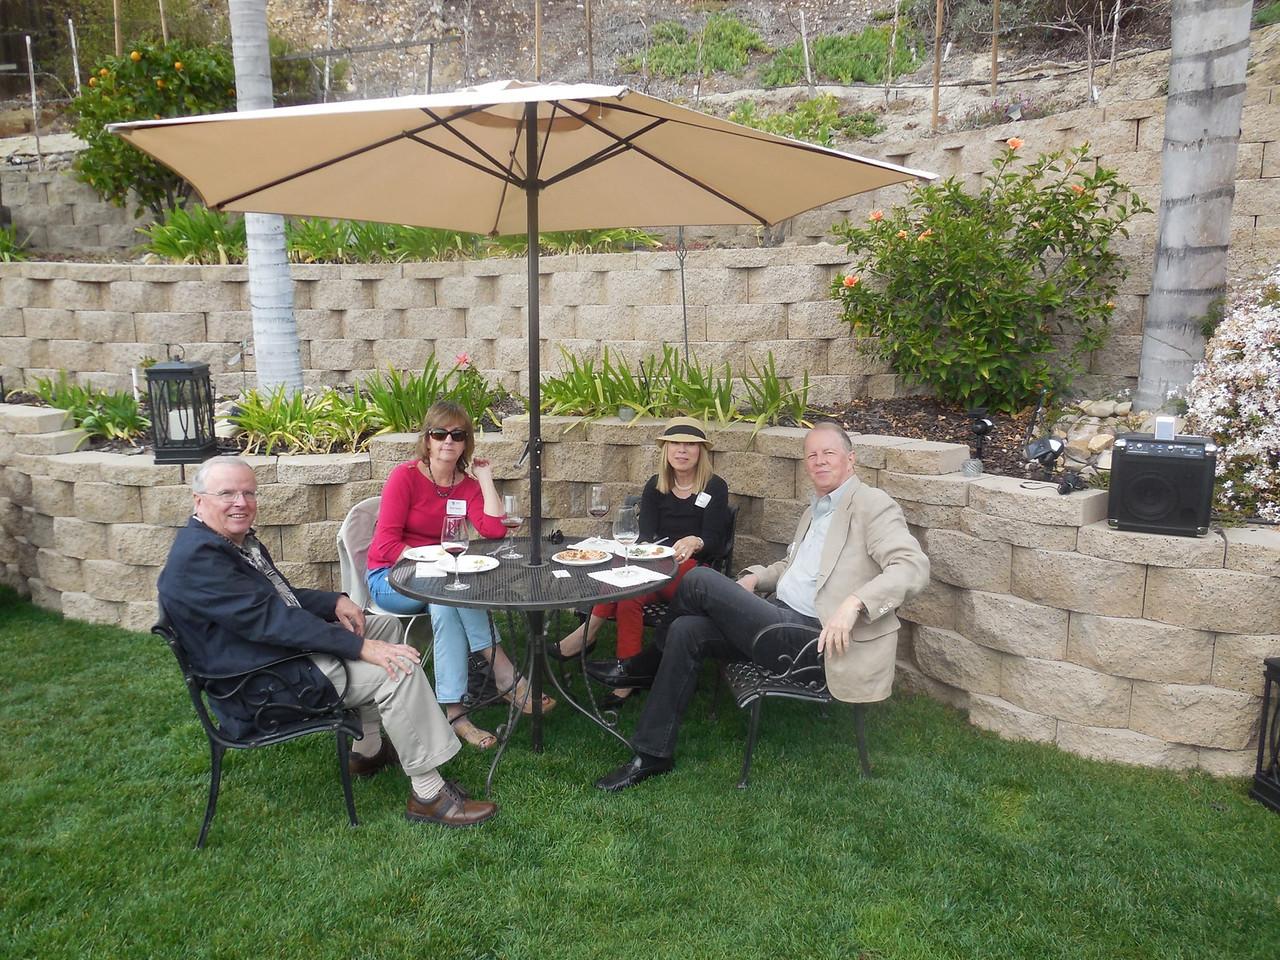 Jim Dwyer (Marq. '74), Mary Dwyer, Bill Pfordresher (Ill. '72) and Rita Kanell.